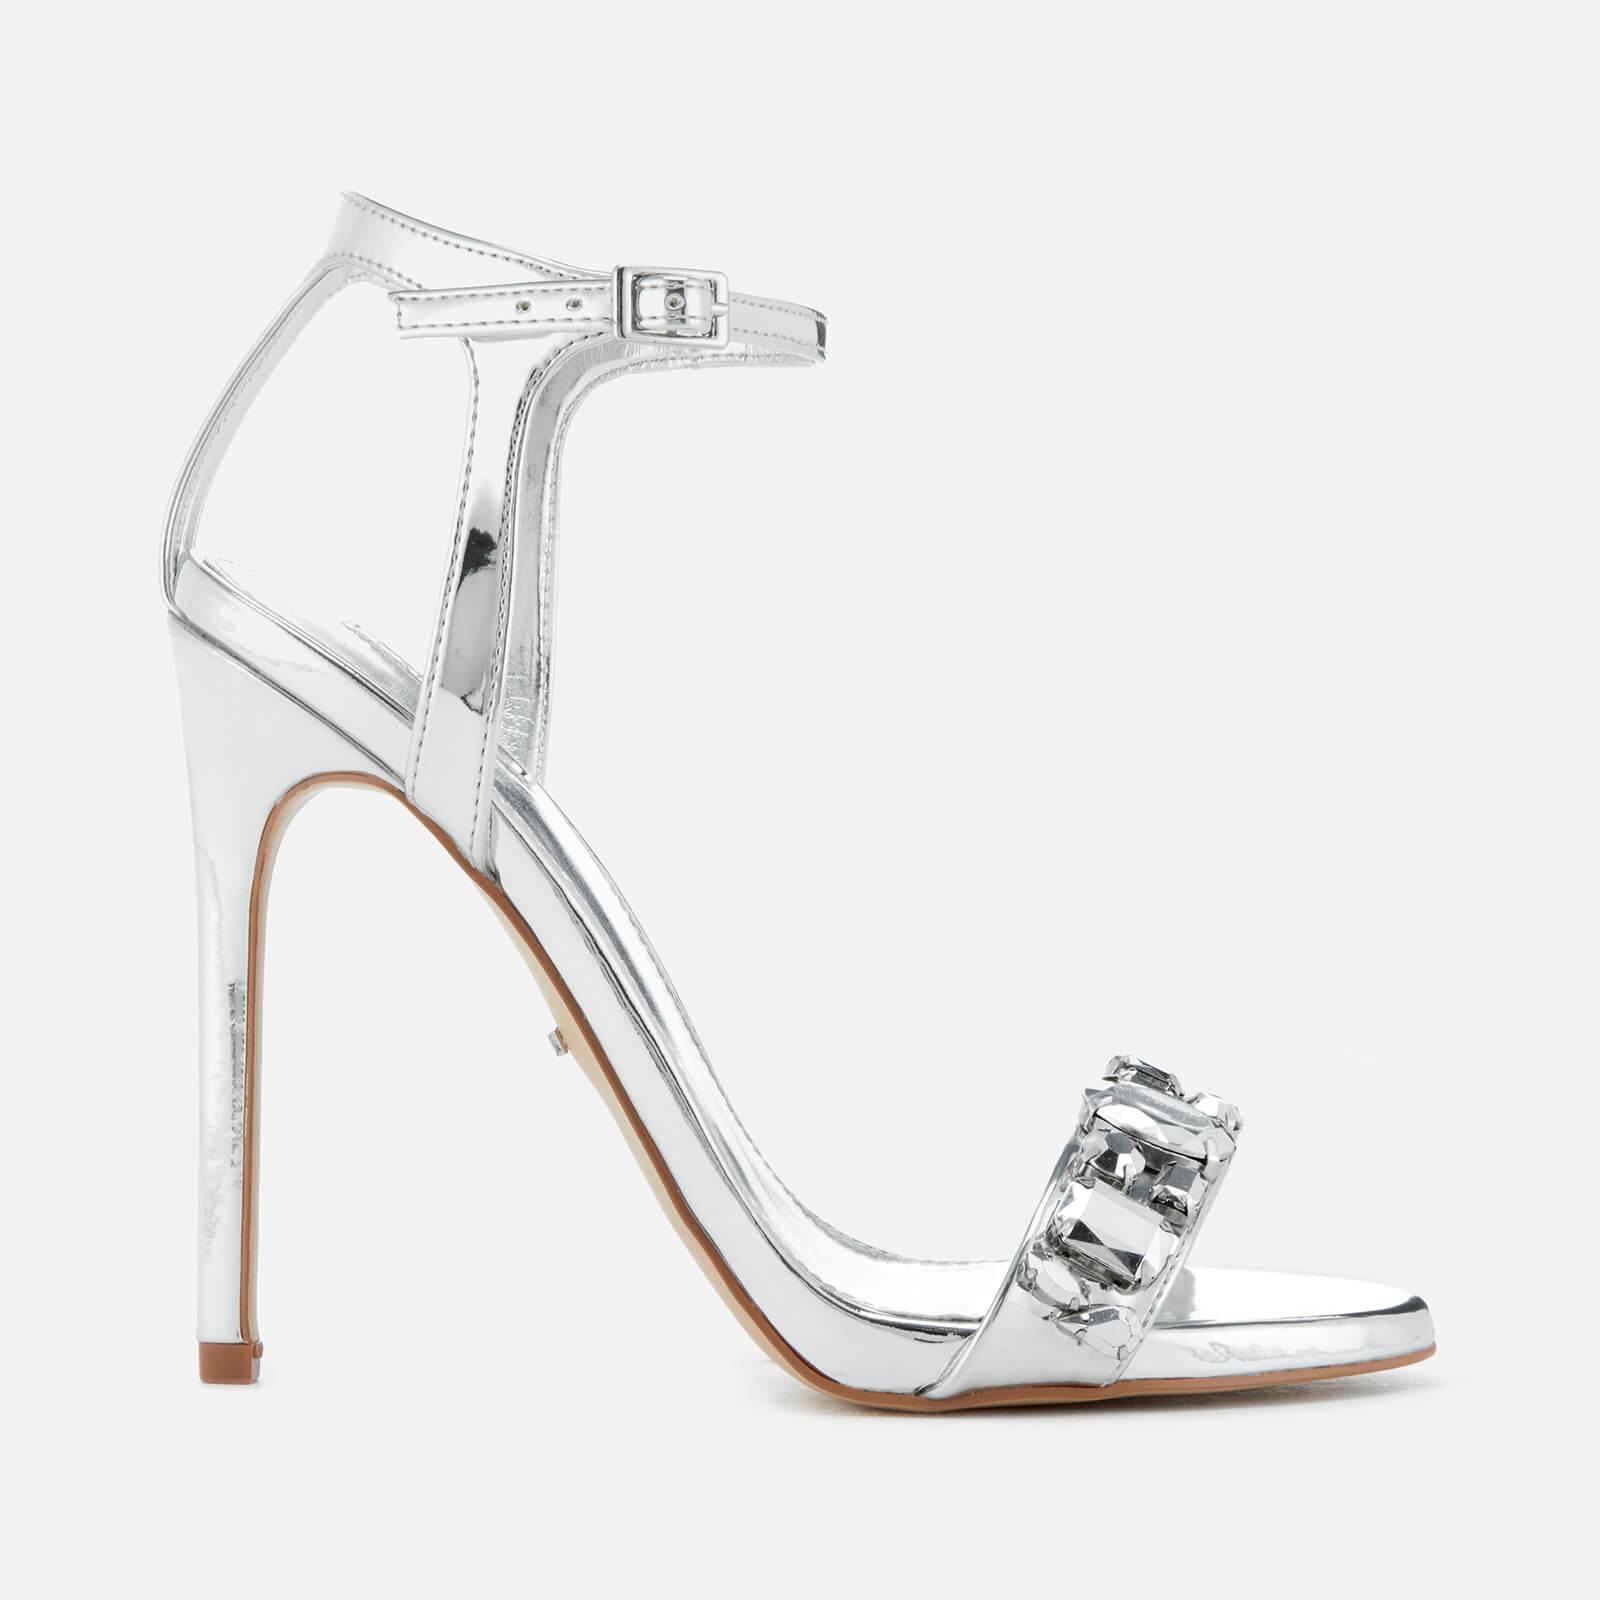 da10f337392c Carvela Kurt Geiger Gail Barely There Heeled Sandals in Metallic - Lyst